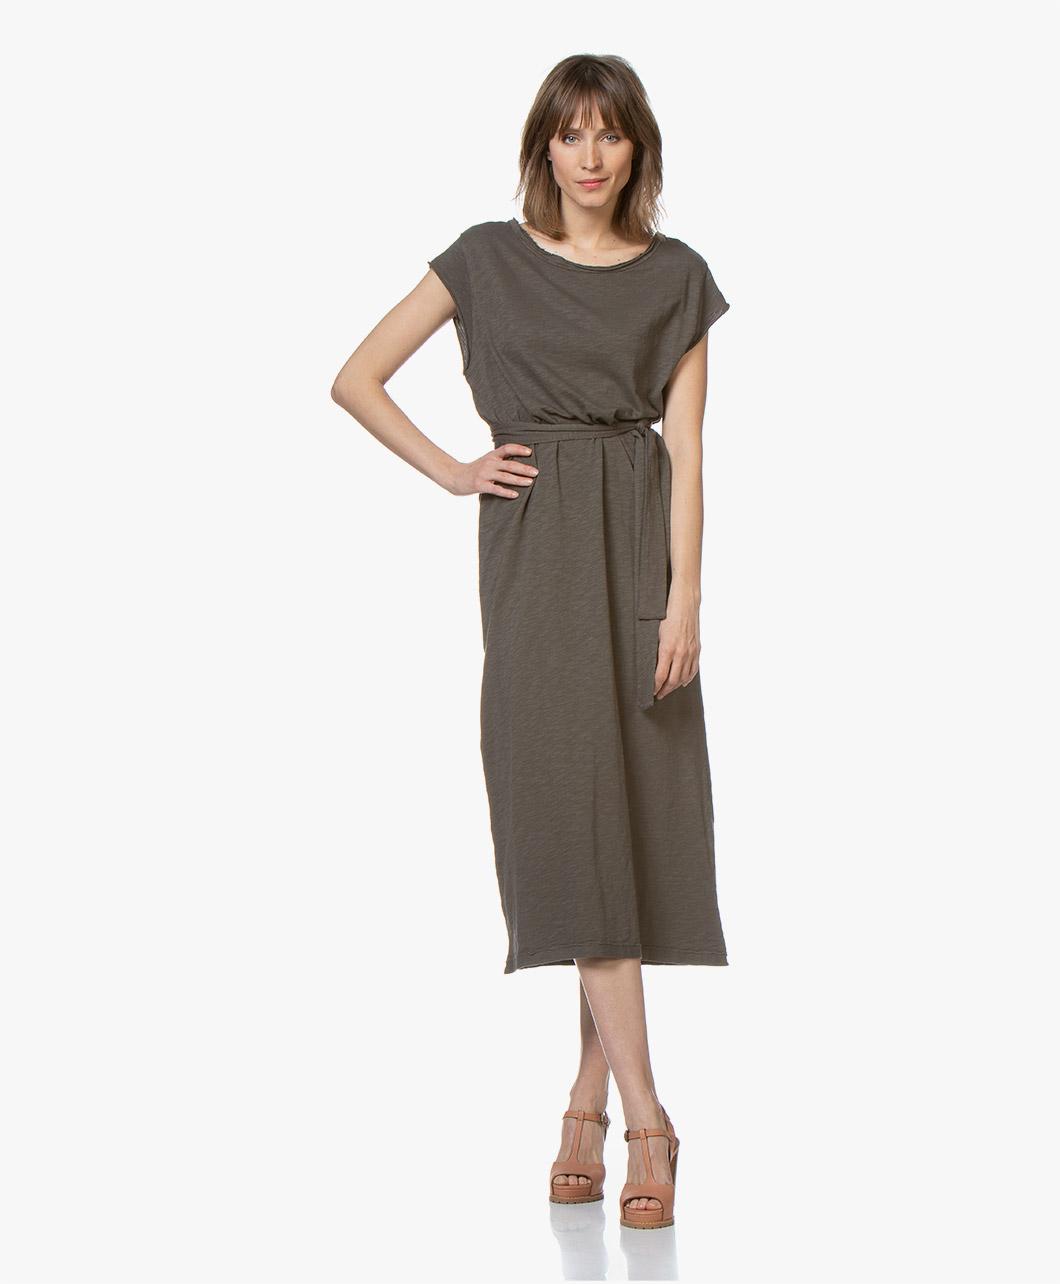 b27844c29d1 American Vintage Bysapick Jersey Midi Dress - Copse - bysa96 bosq